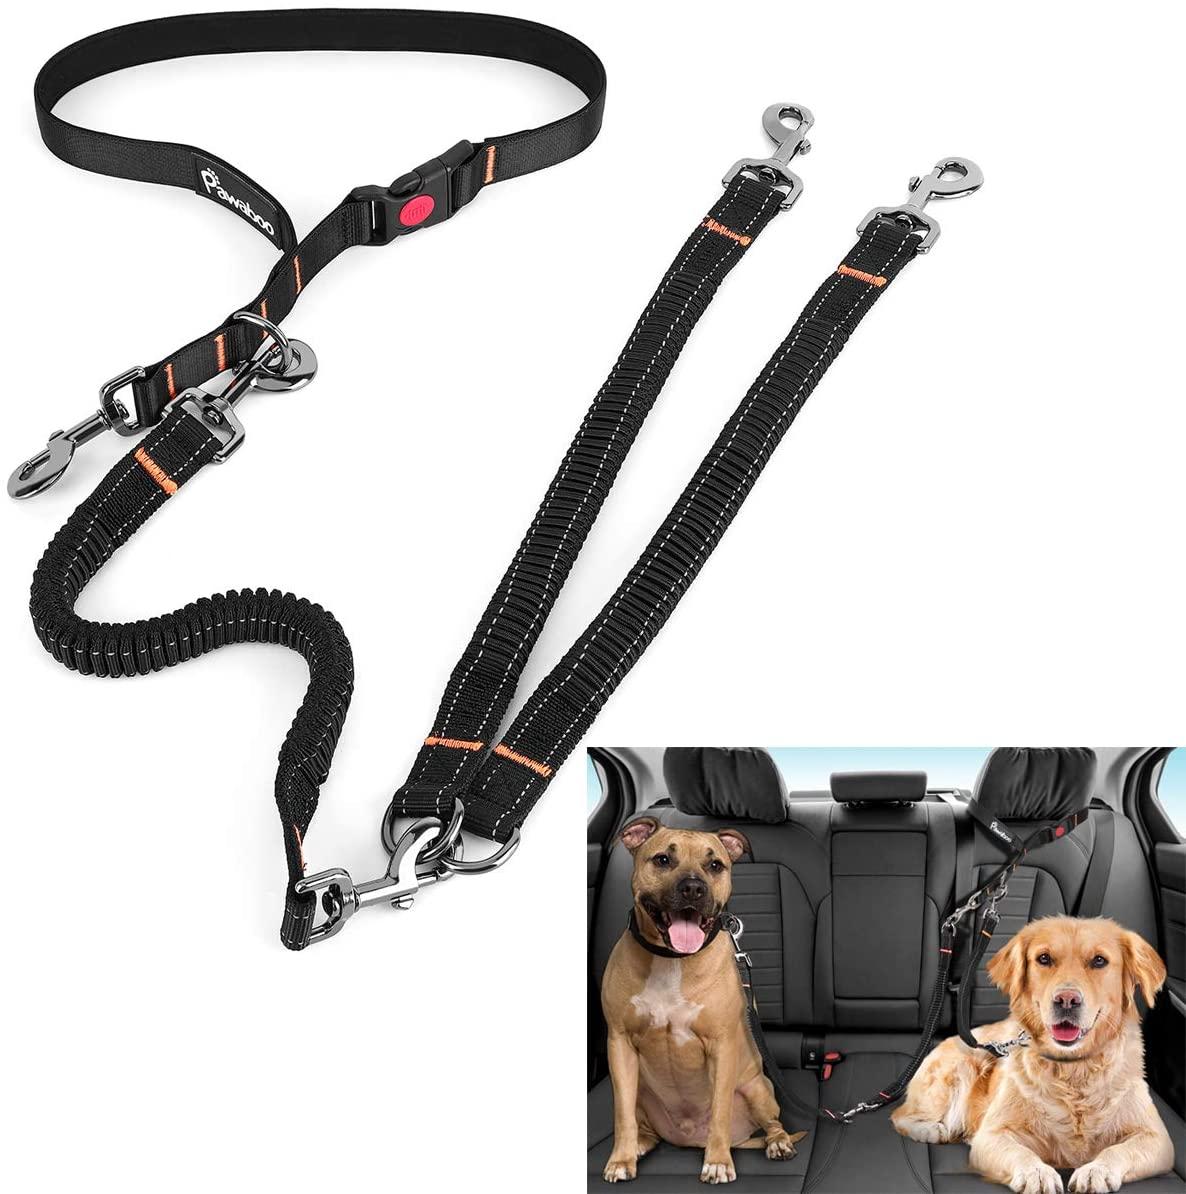 Pawaboo Dog Seatbelt, Upgraded Adjustable Nylon Pet Car Seat belt Harness Headrest Restraint, Bungee Double Dog Leash Reflective Vehicle Safety Leads Strap for Travel for Small Medium Large Dog, Black